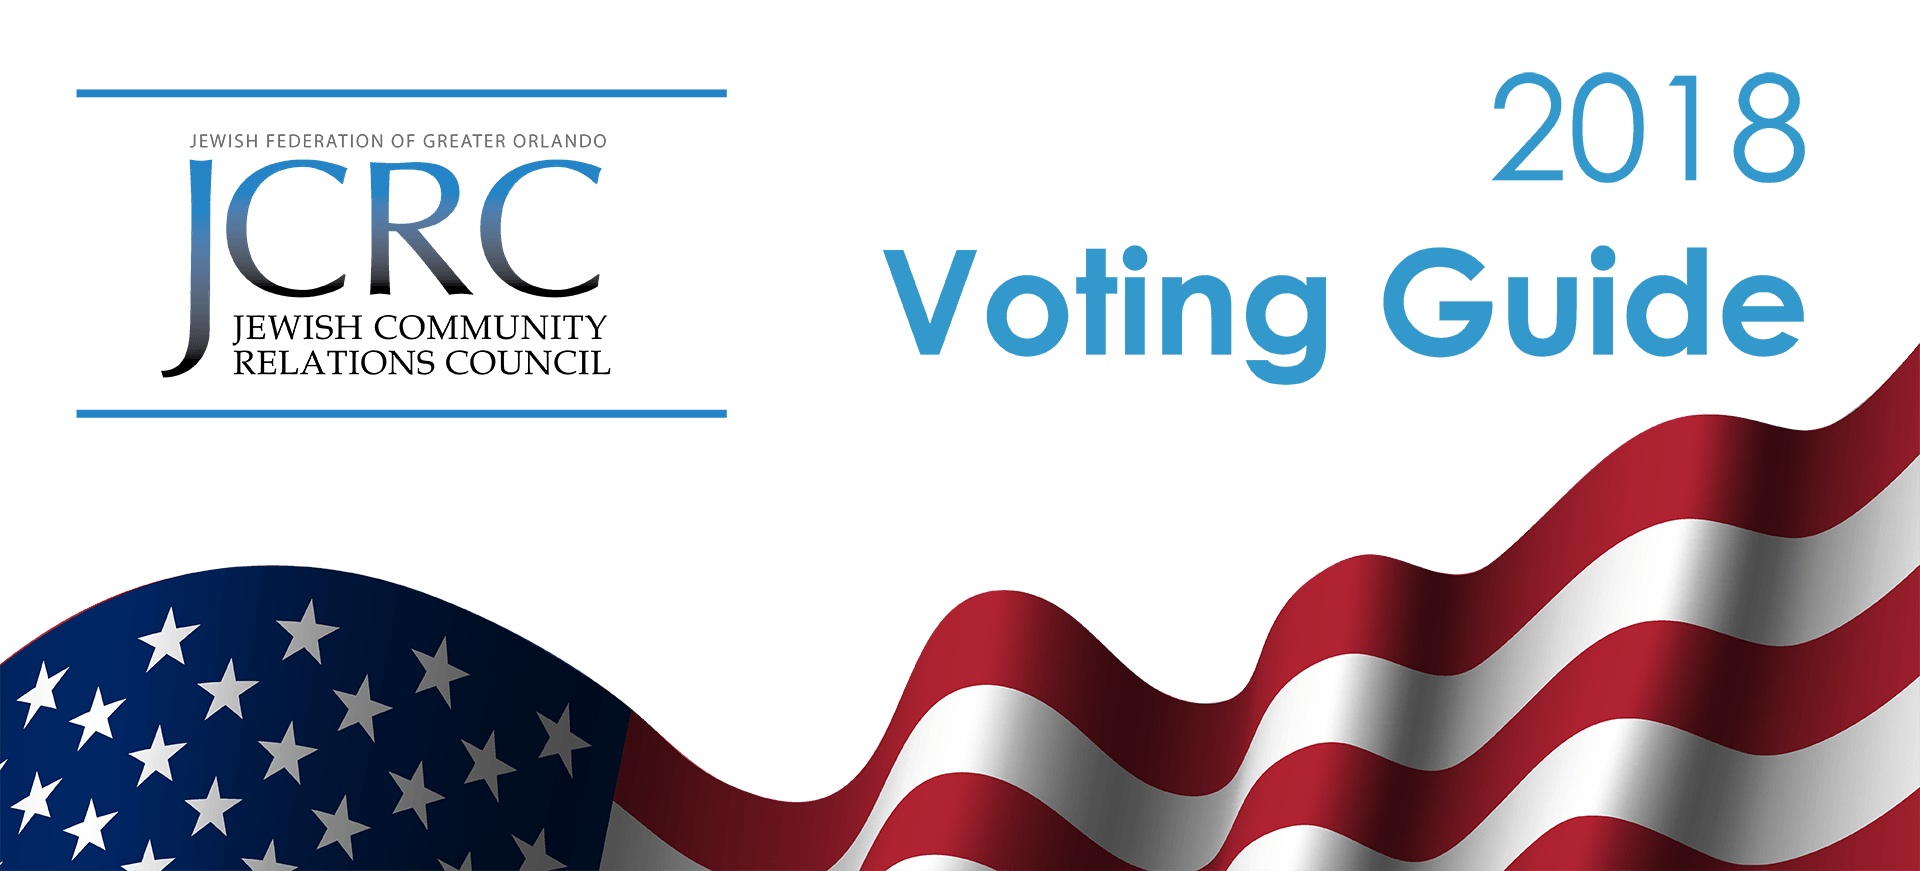 Vote | Jewish Federation of Greater Orlando